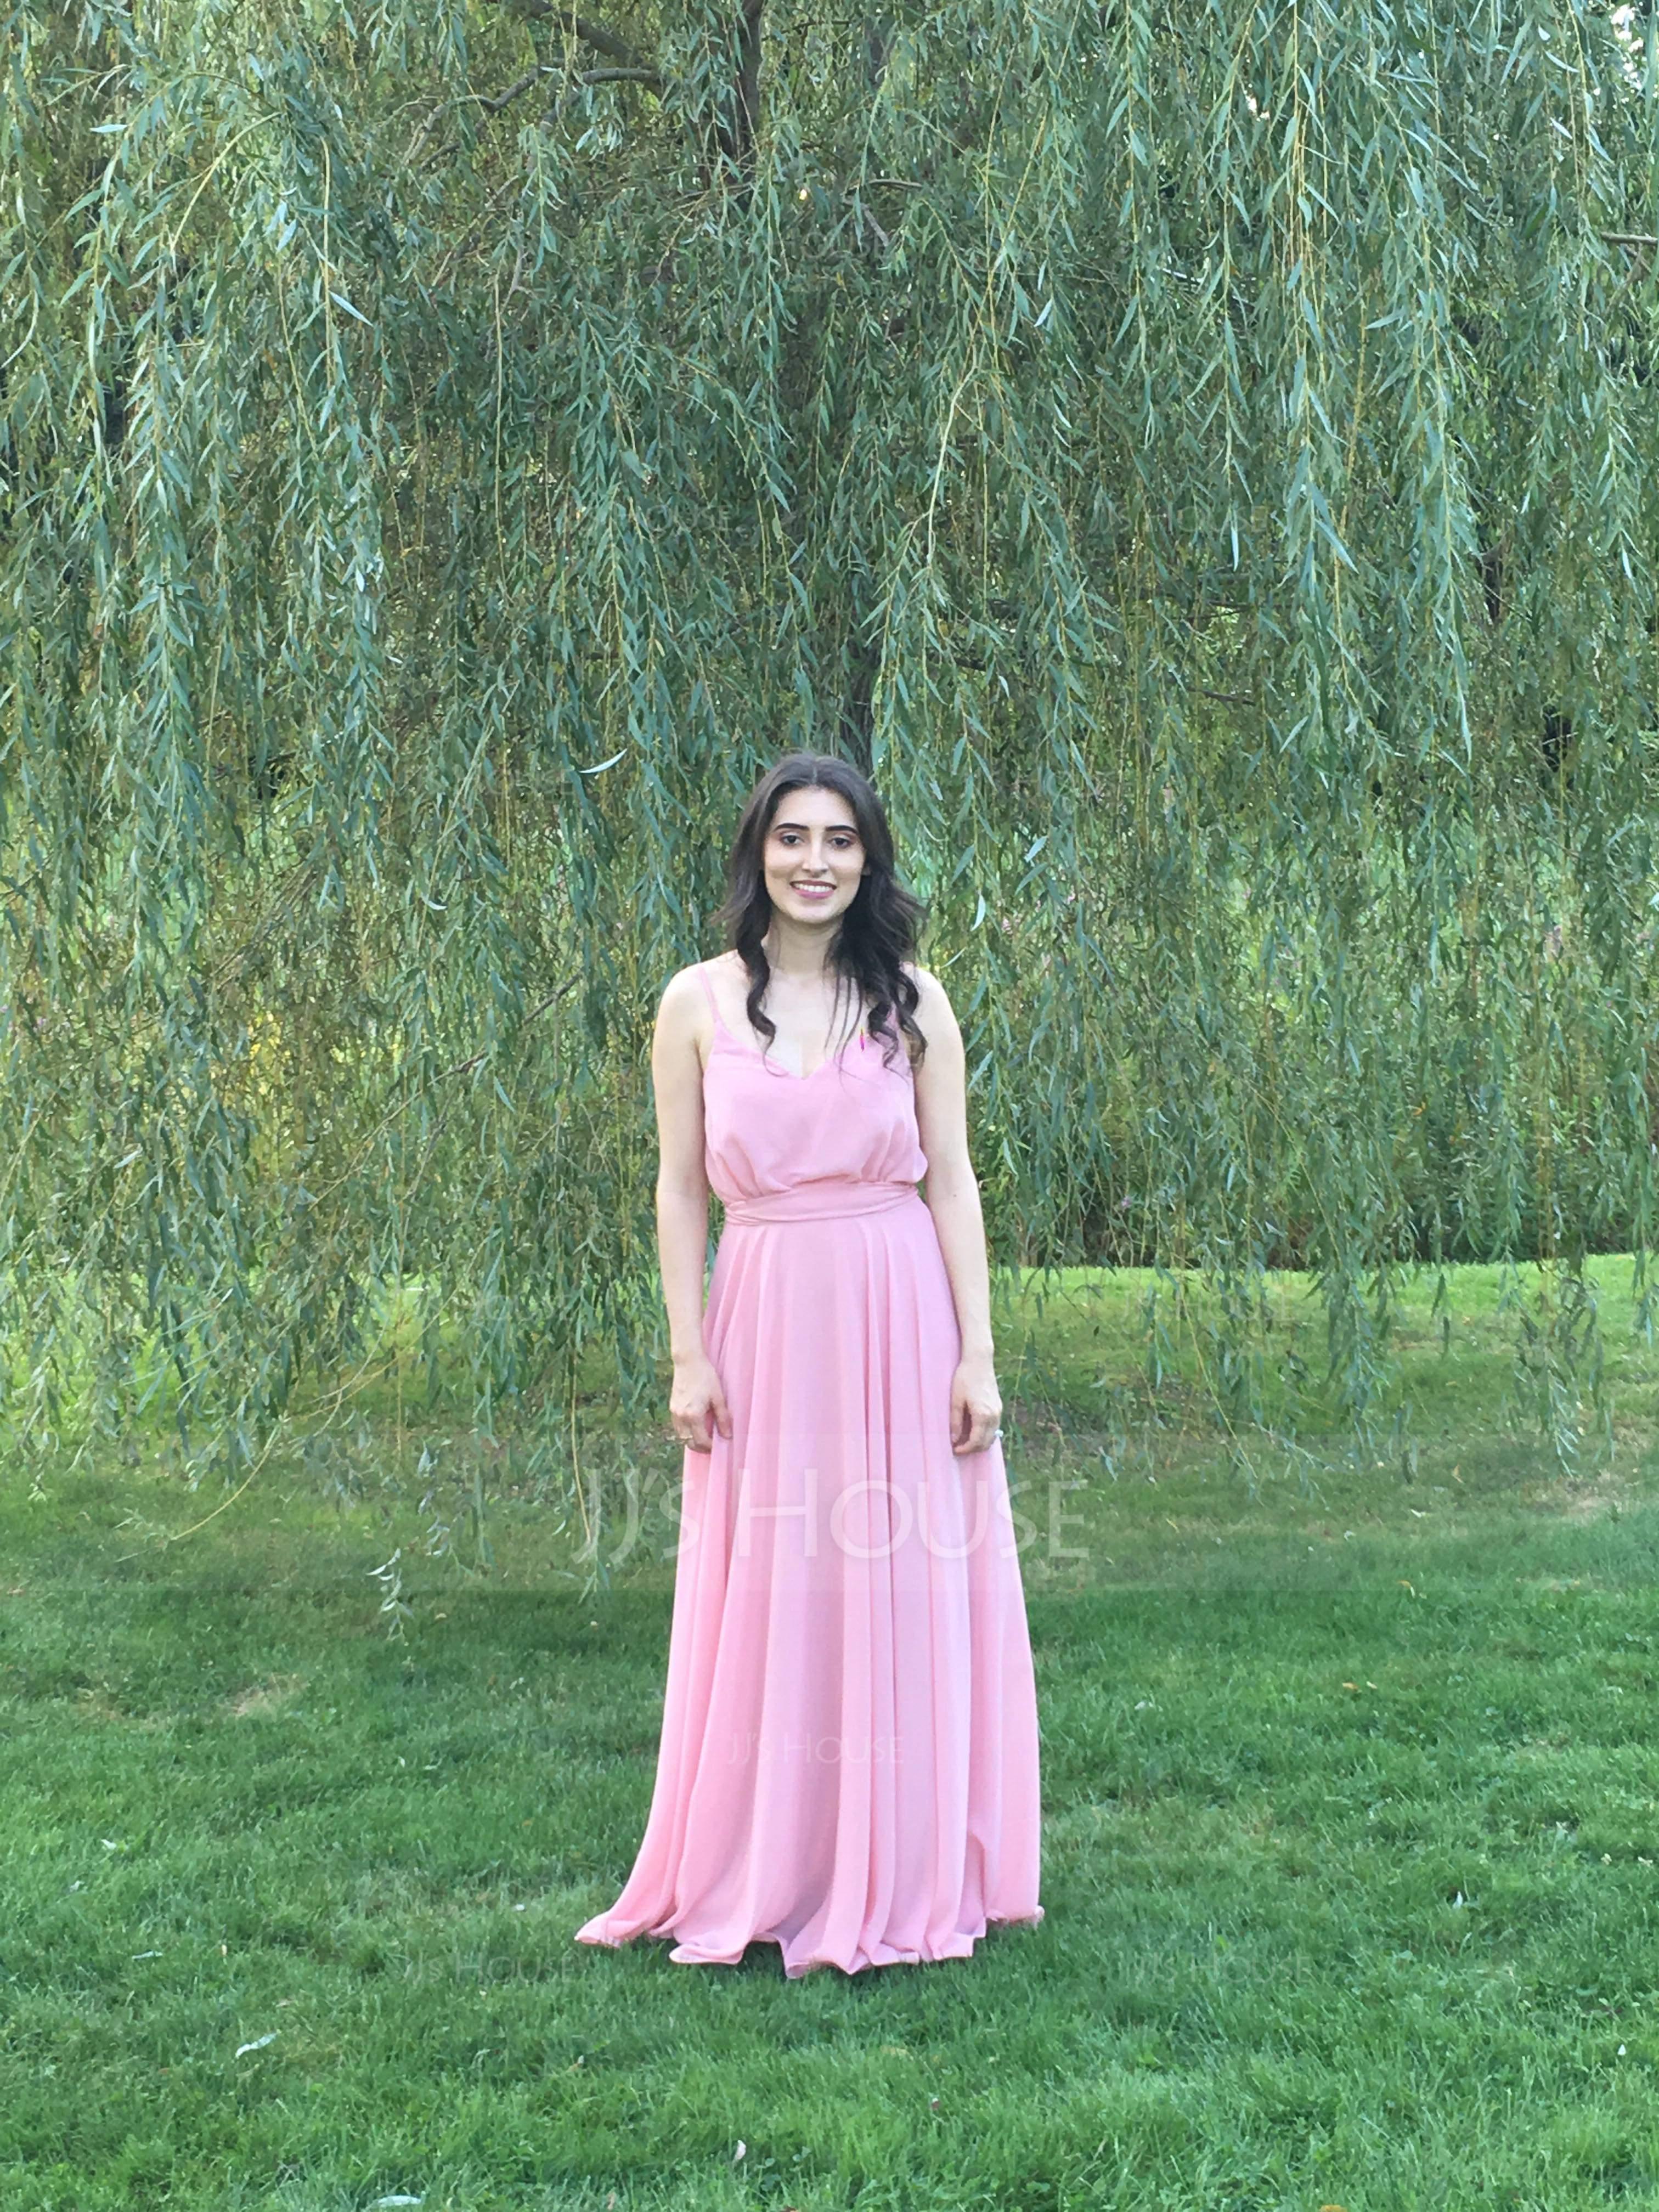 A-Line/Princess V-neck Floor-Length Chiffon Bridesmaid Dress With Bow(s) (007144765)